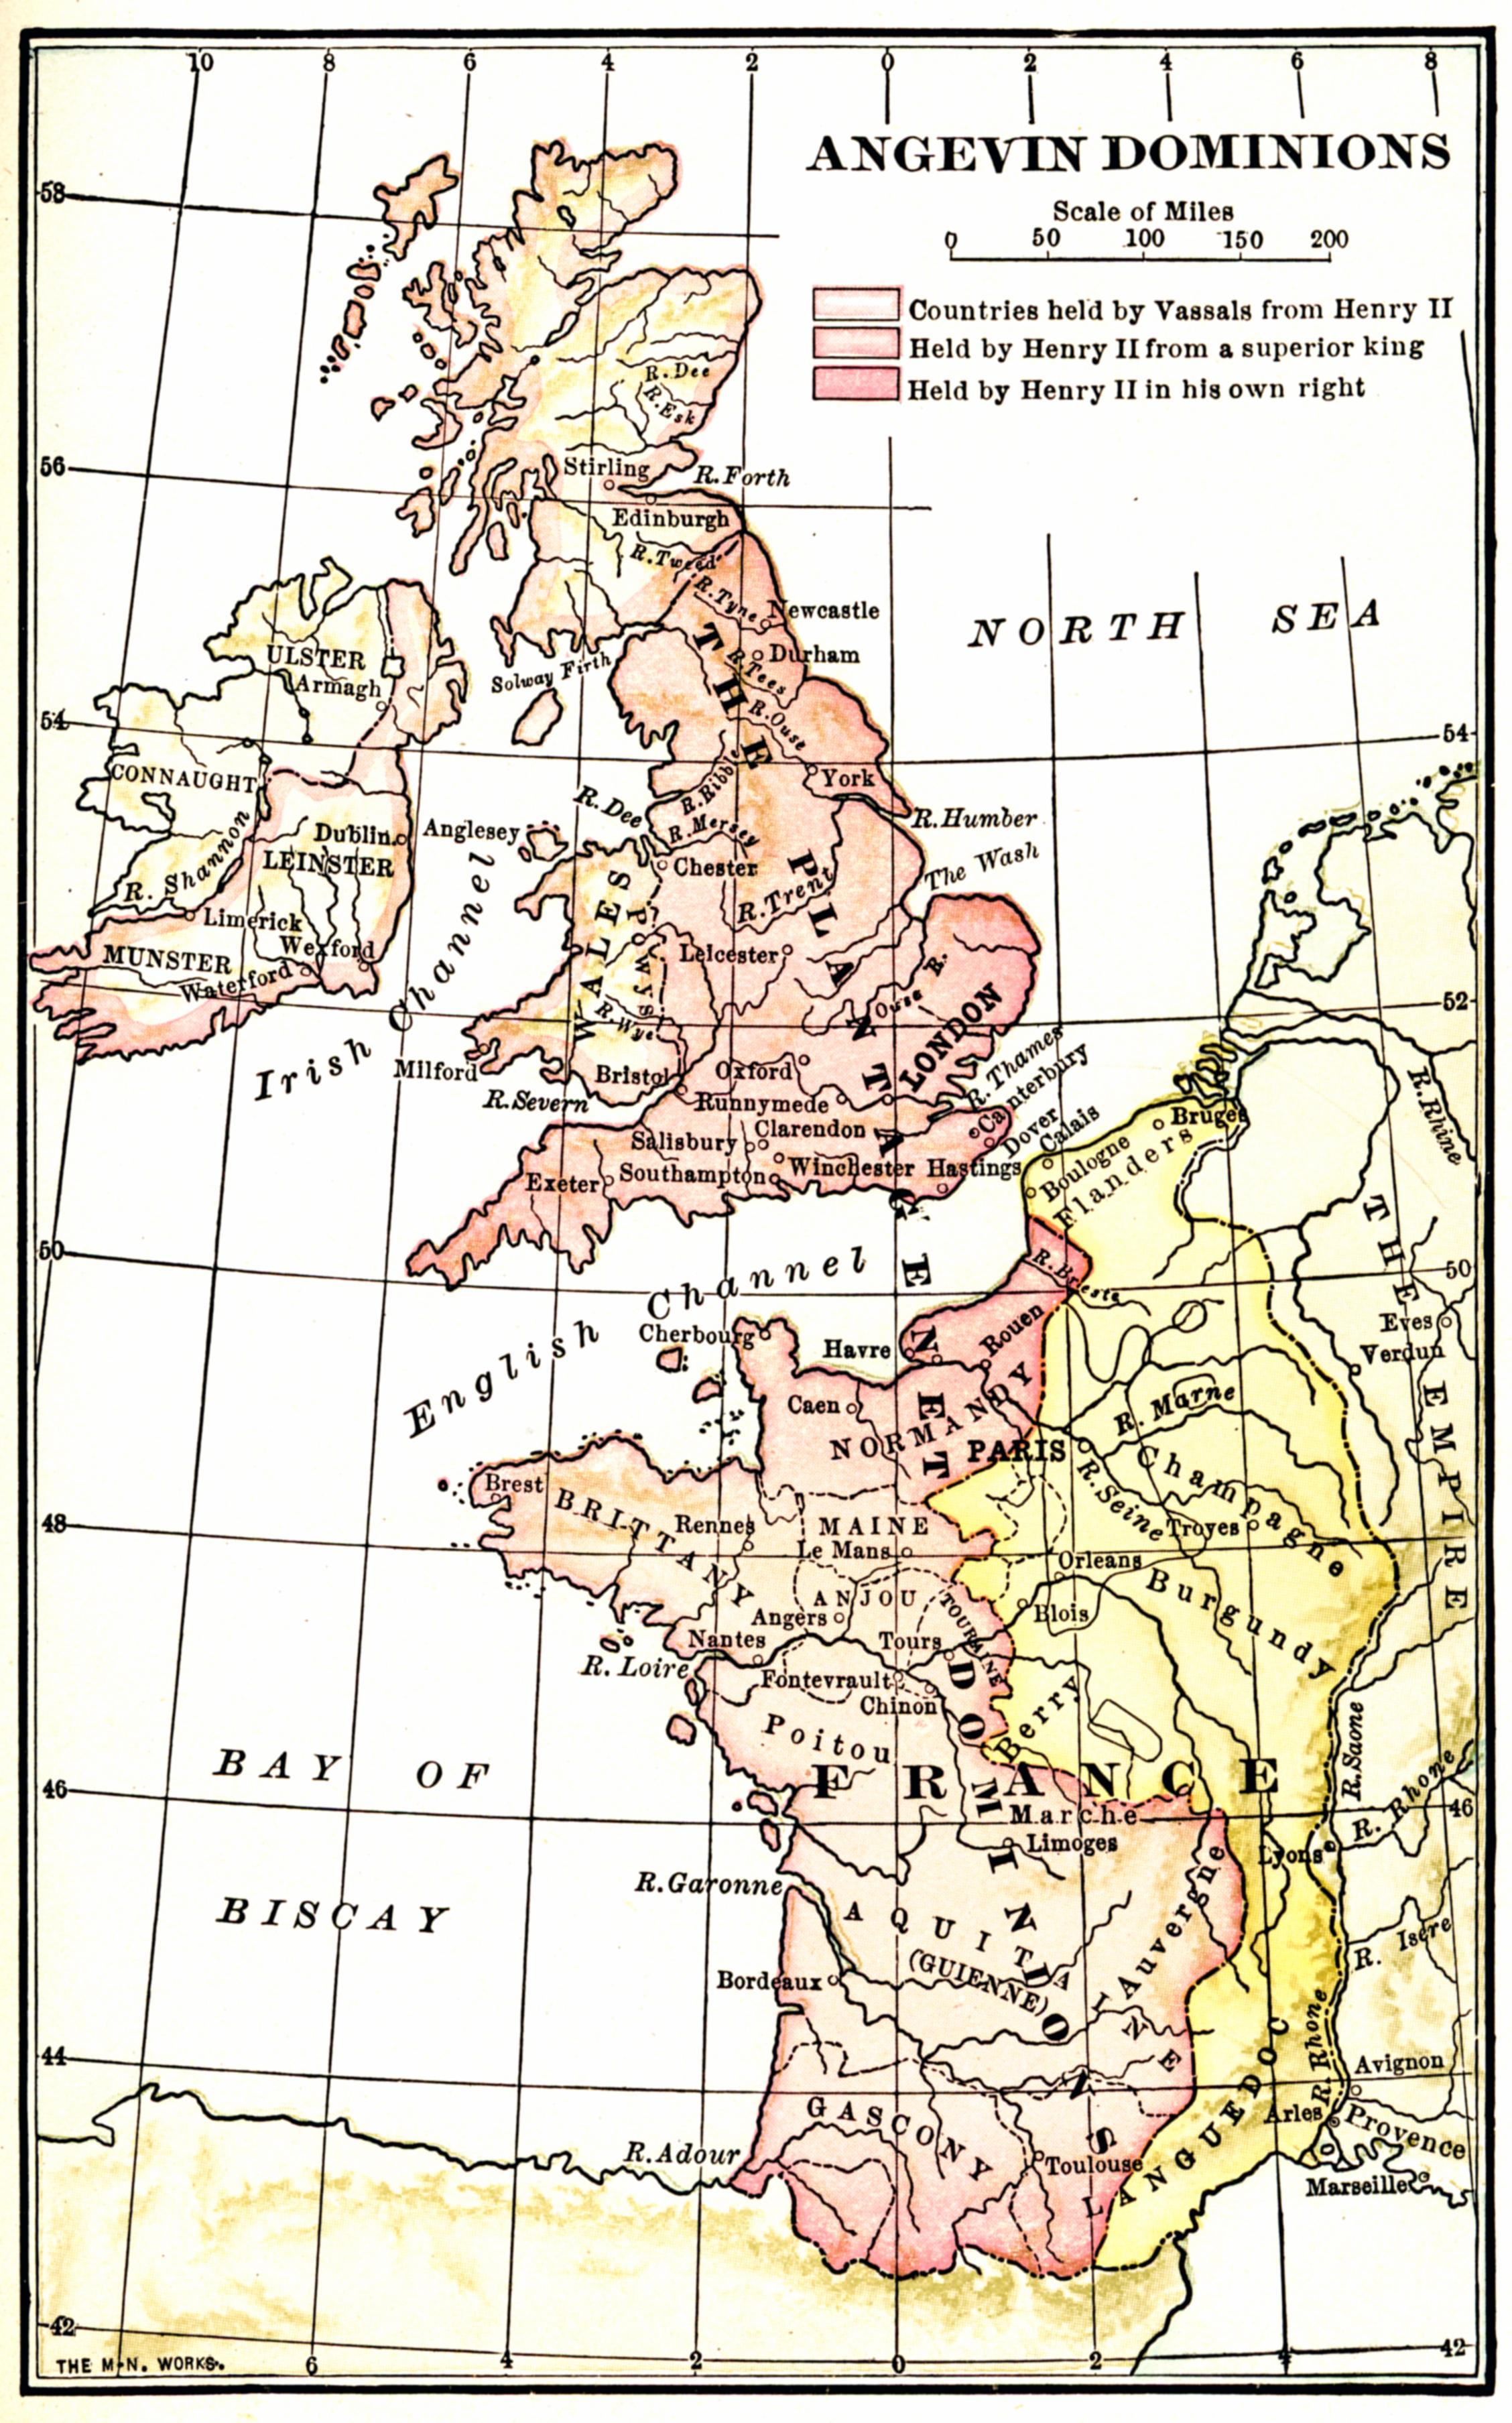 1201 in Ireland